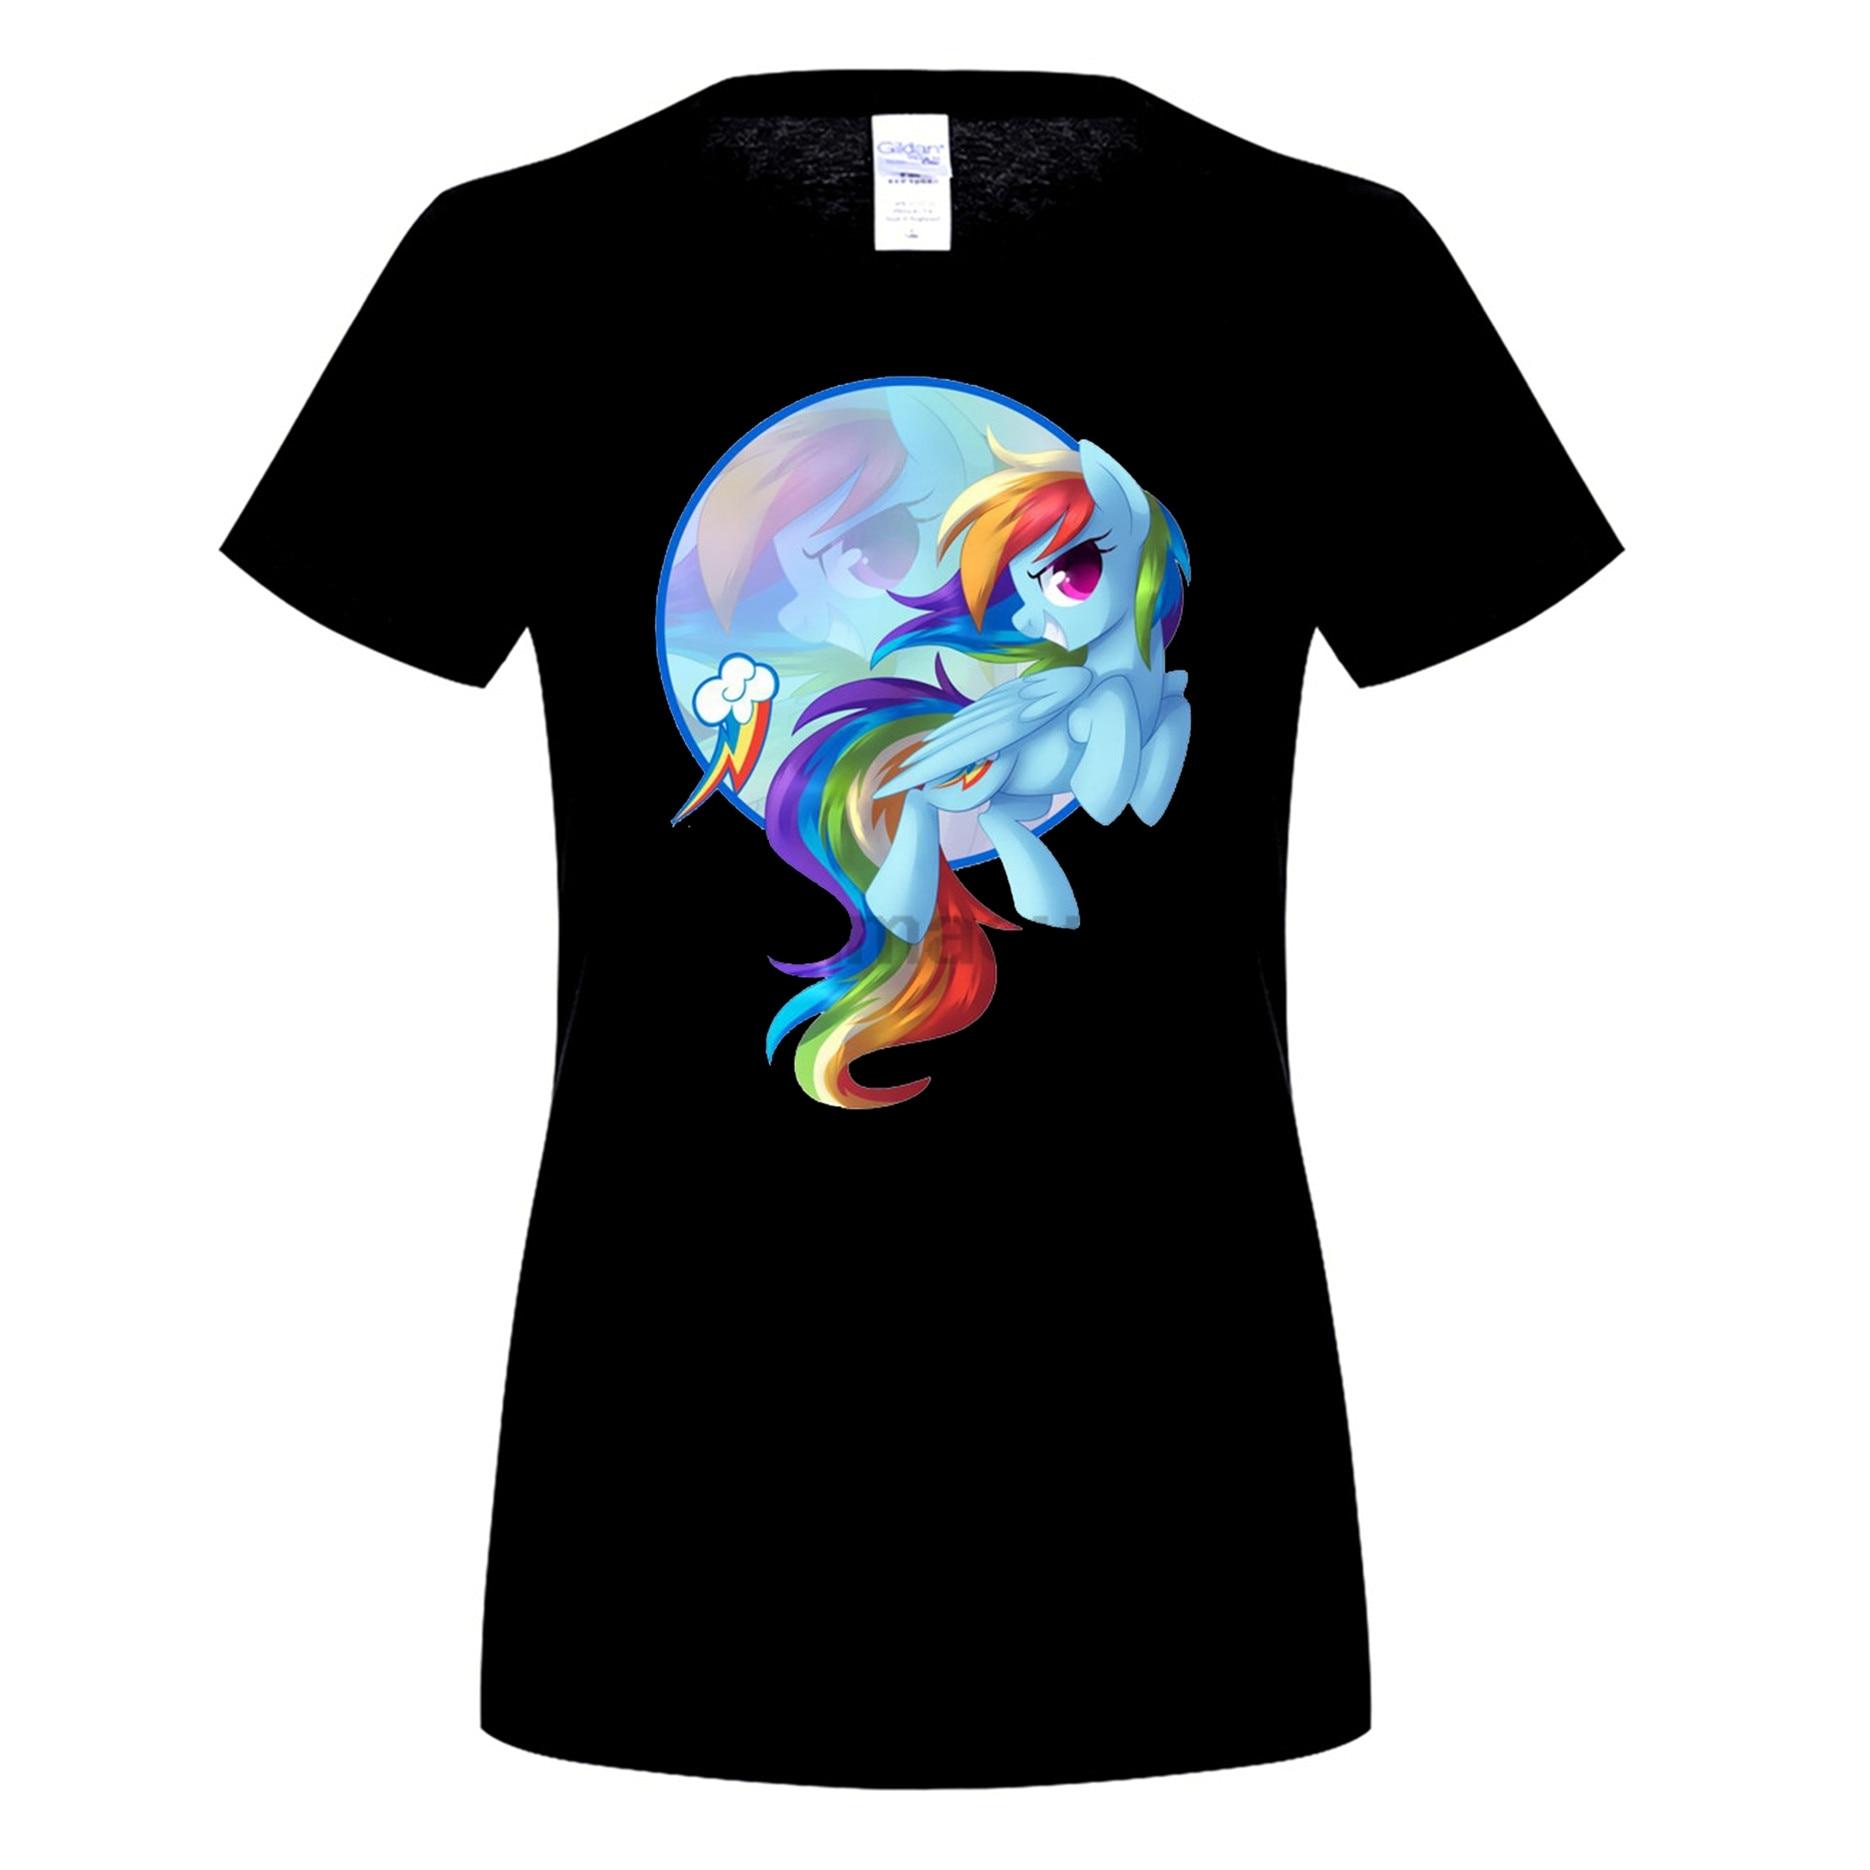 GILDAN cotton O-neck printed T-shirt Rainbow Dash T-Shirt for woman